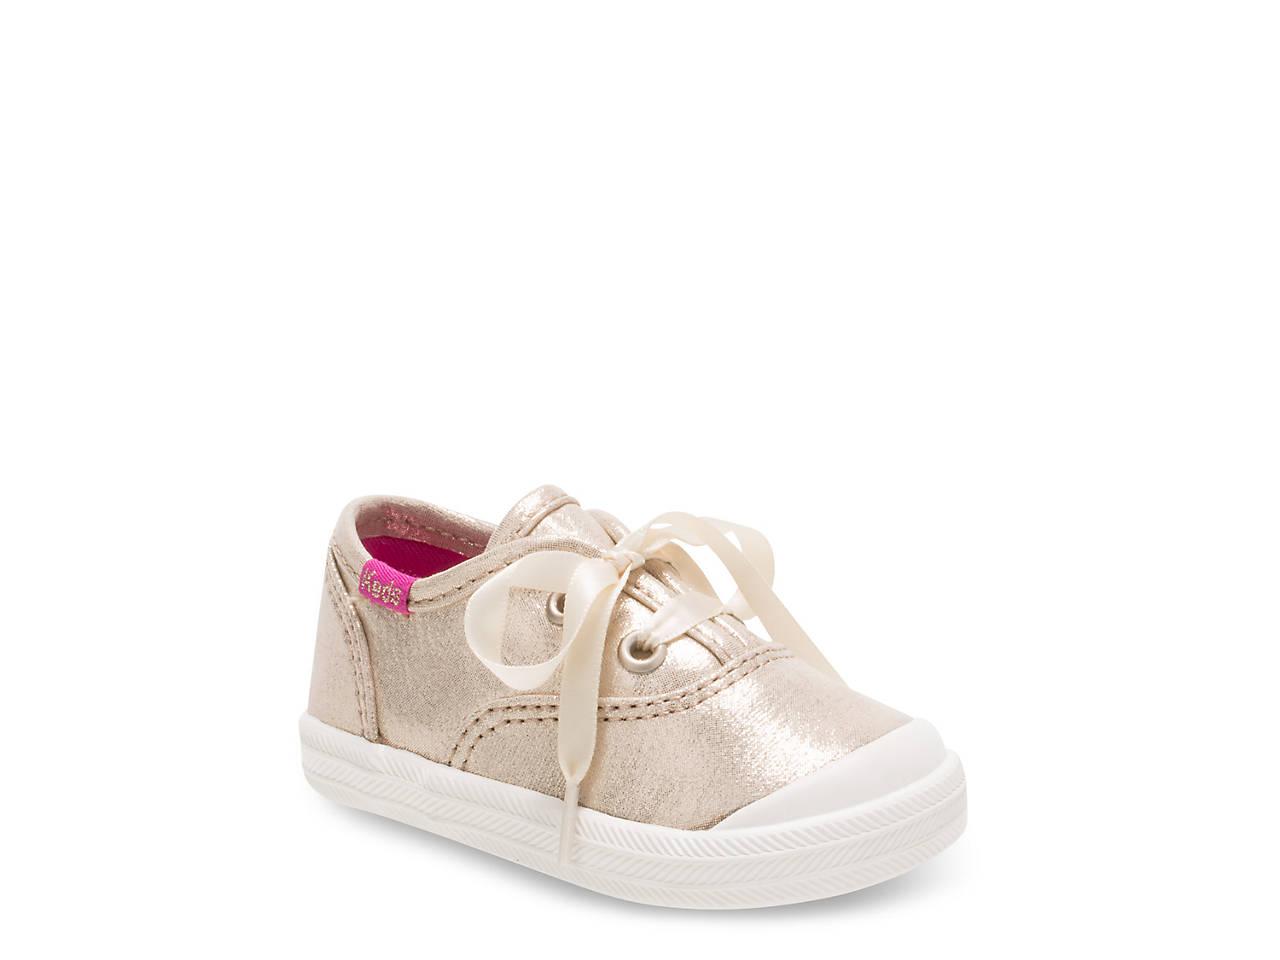 adff43a3ed826 Keds Champion Infant Sneaker Kids Shoes